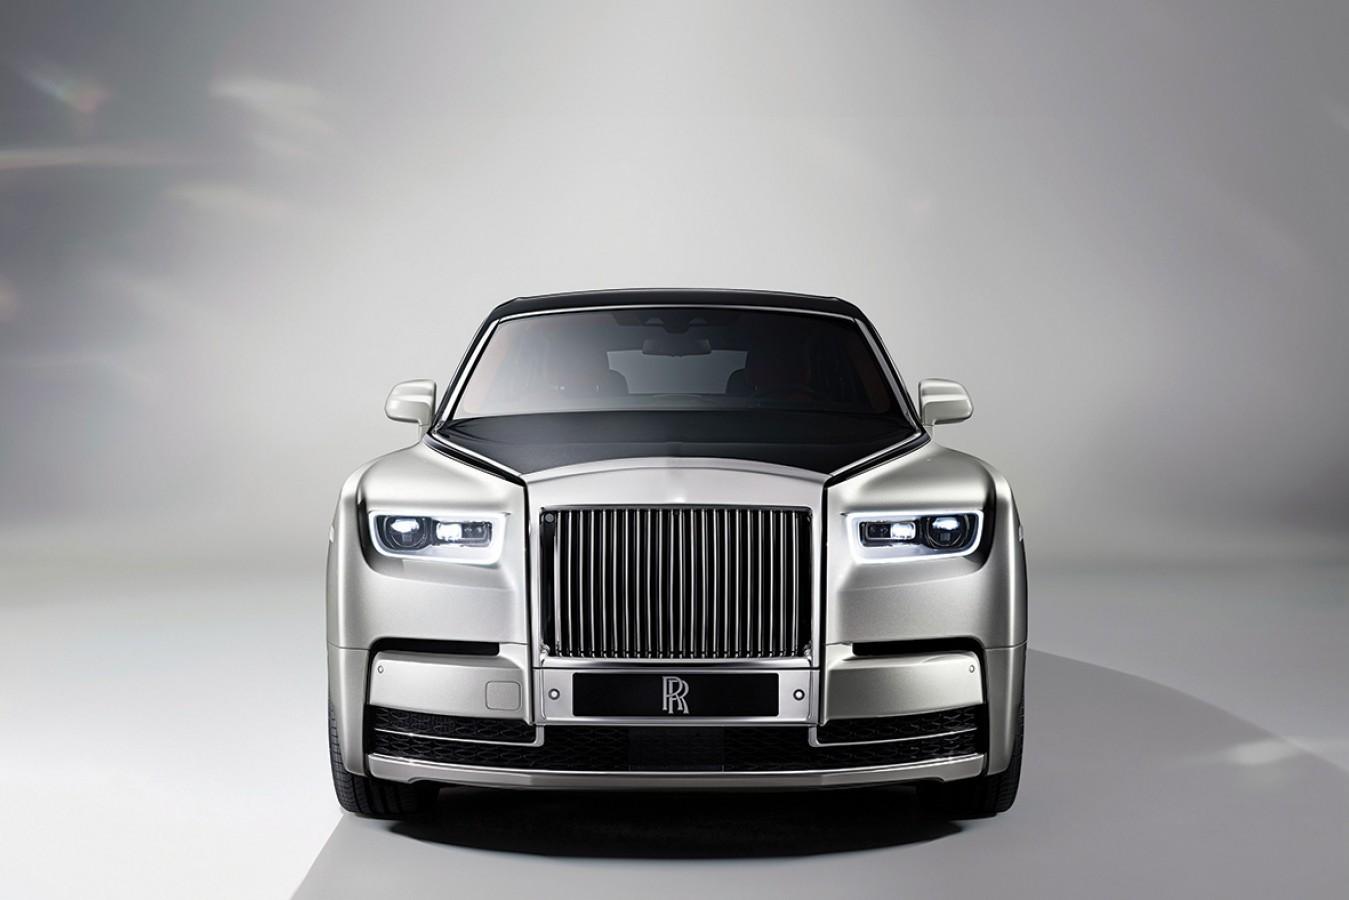 Fotomural Rolls Royce Attitude A08-M932 Fotomural Rolls Royce Attitude A08-M932